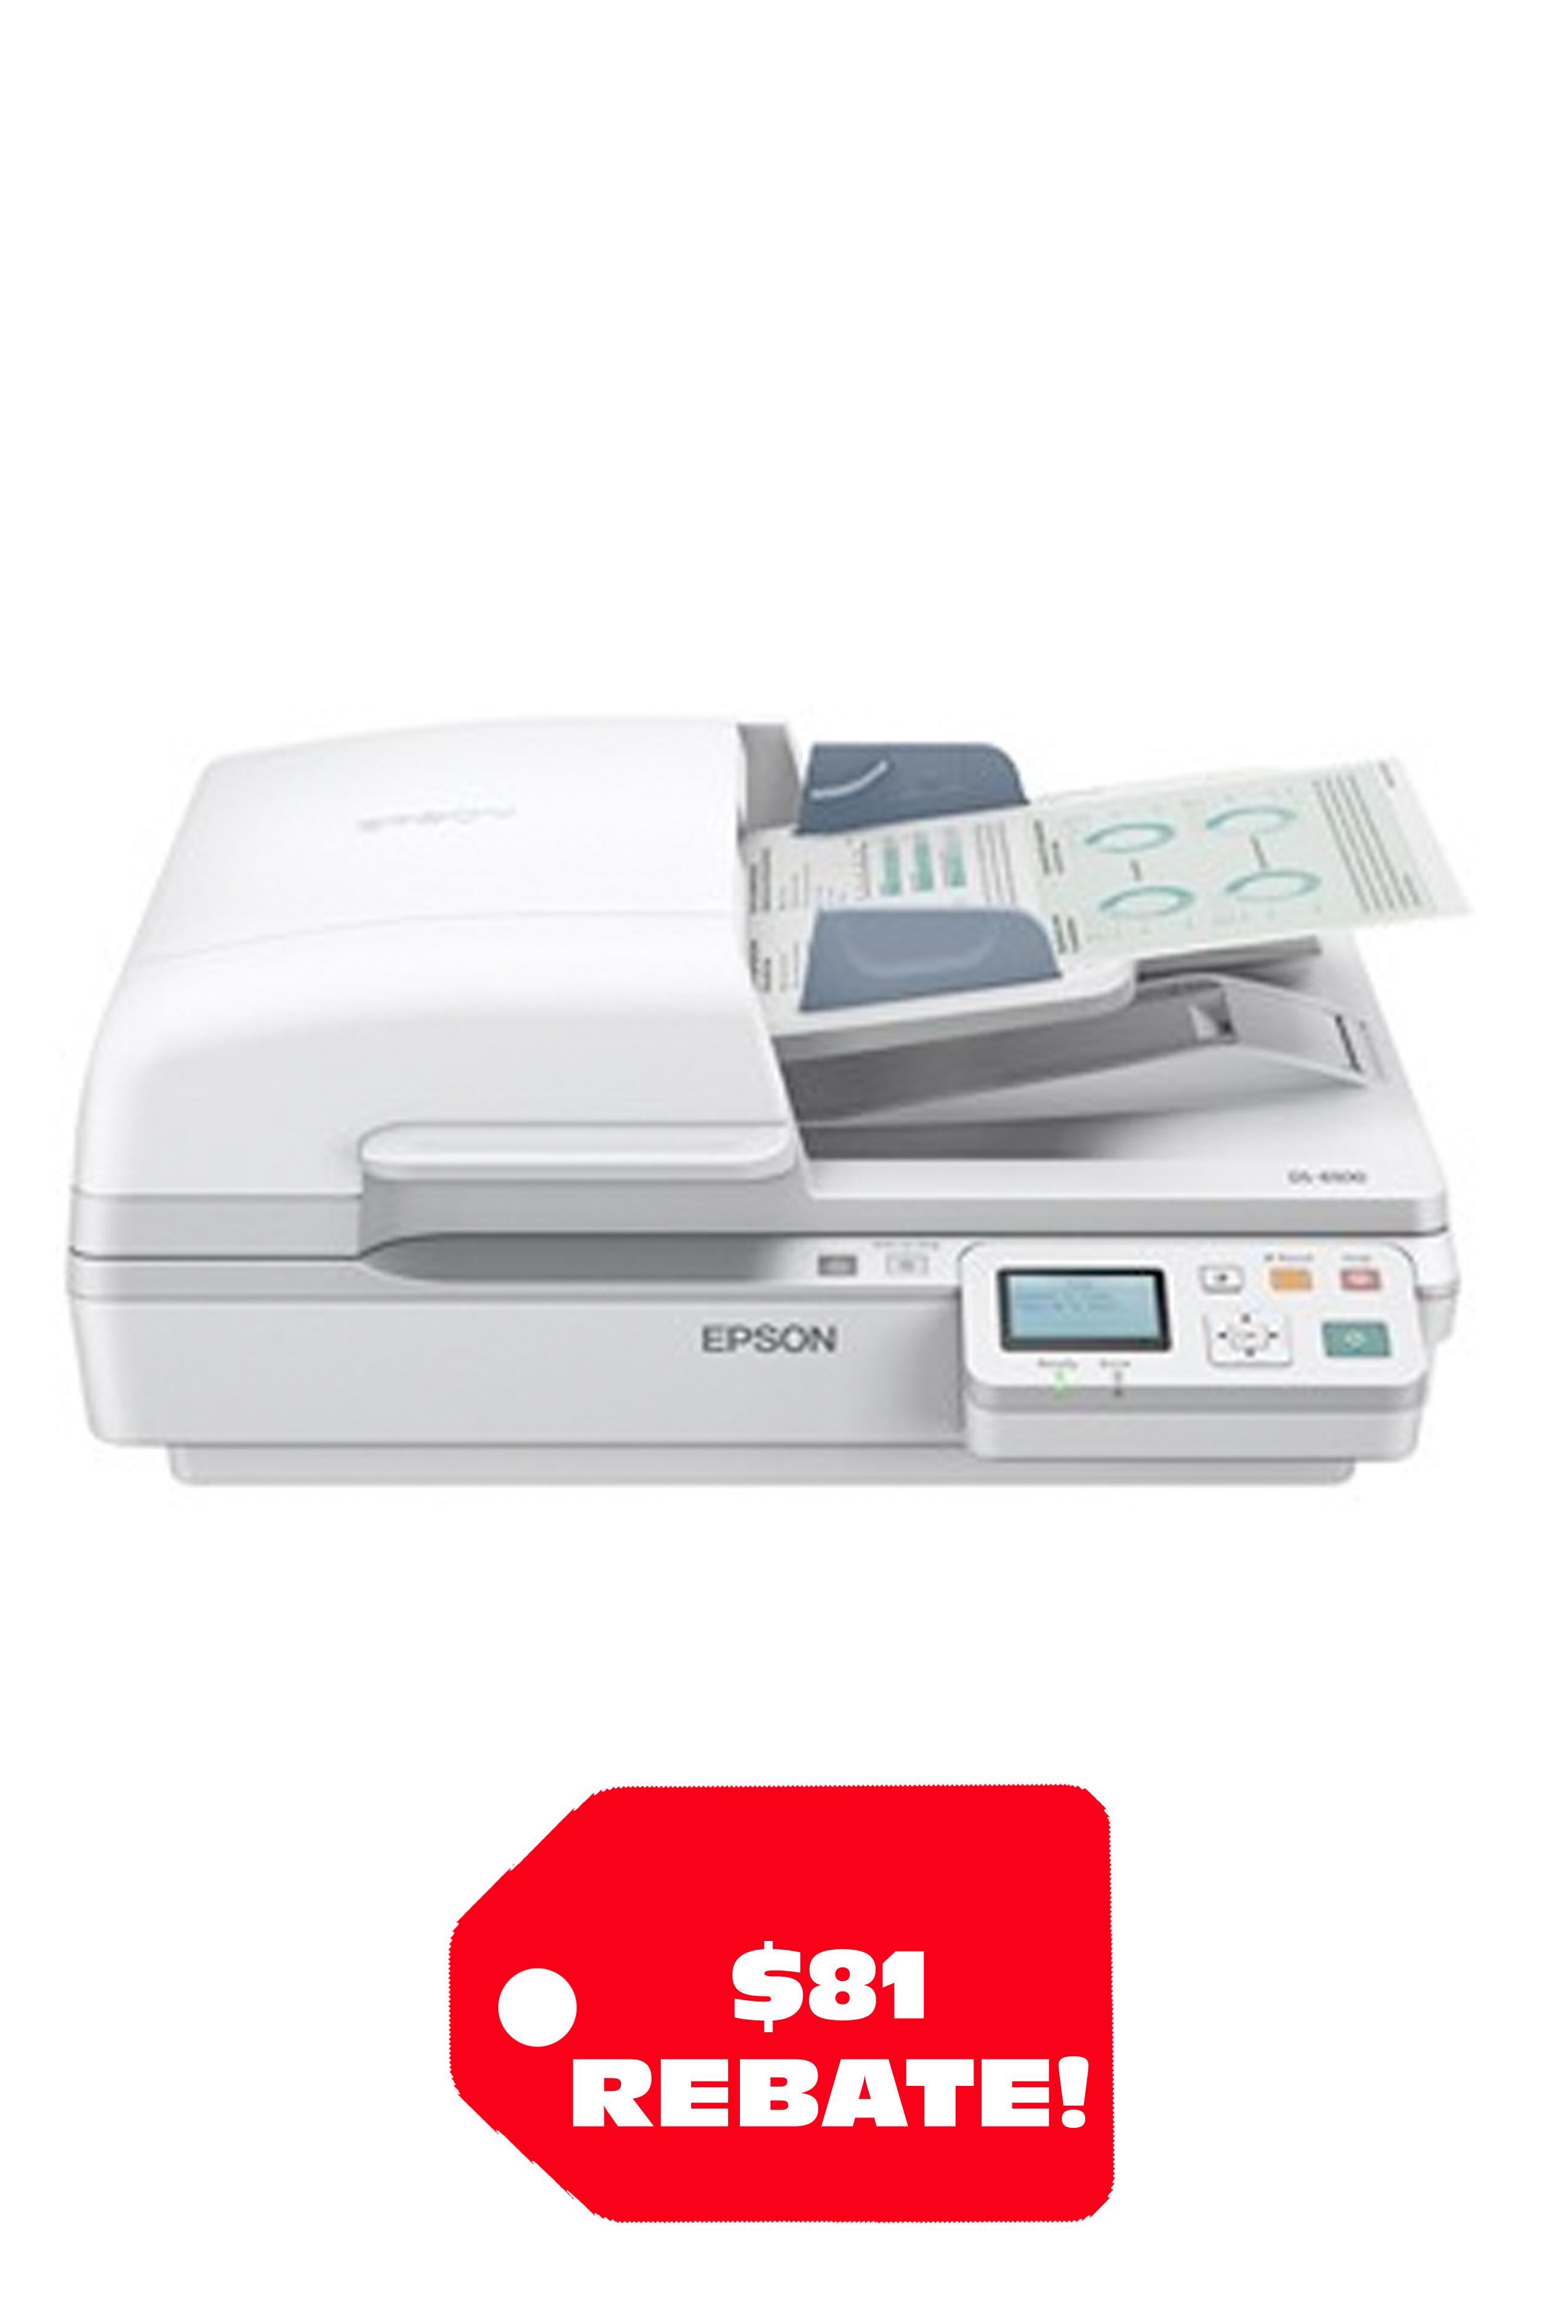 Epson WorkForce DS-6500 Color Document Scanner (25/50ppm)